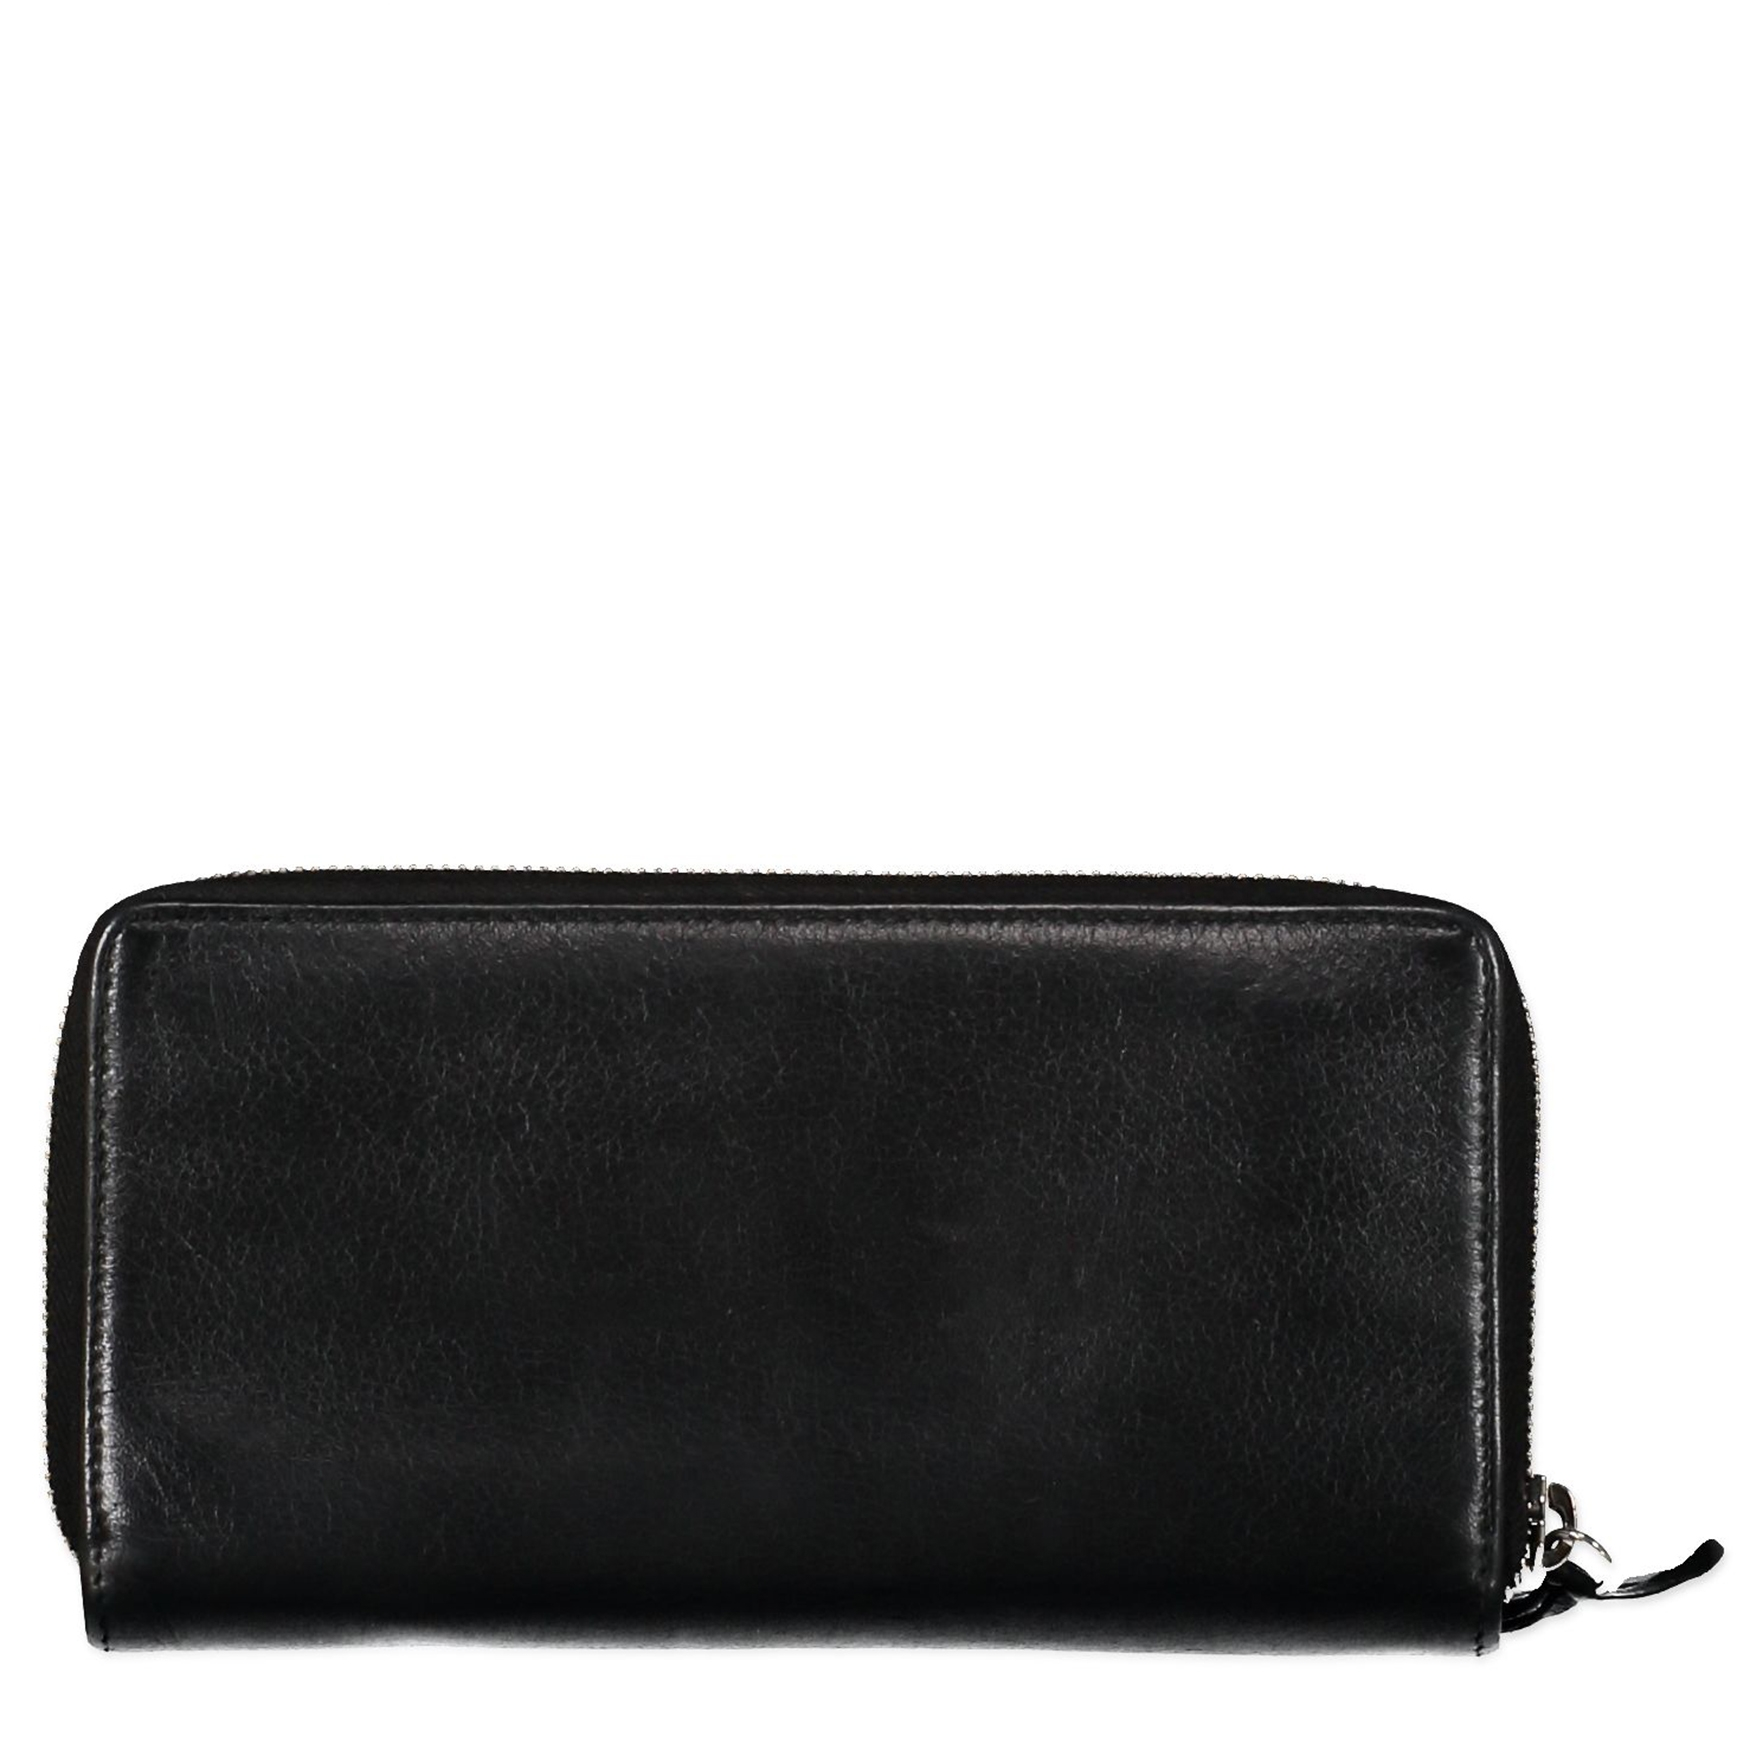 Balenciaga Black Continental Zip Around Wallet